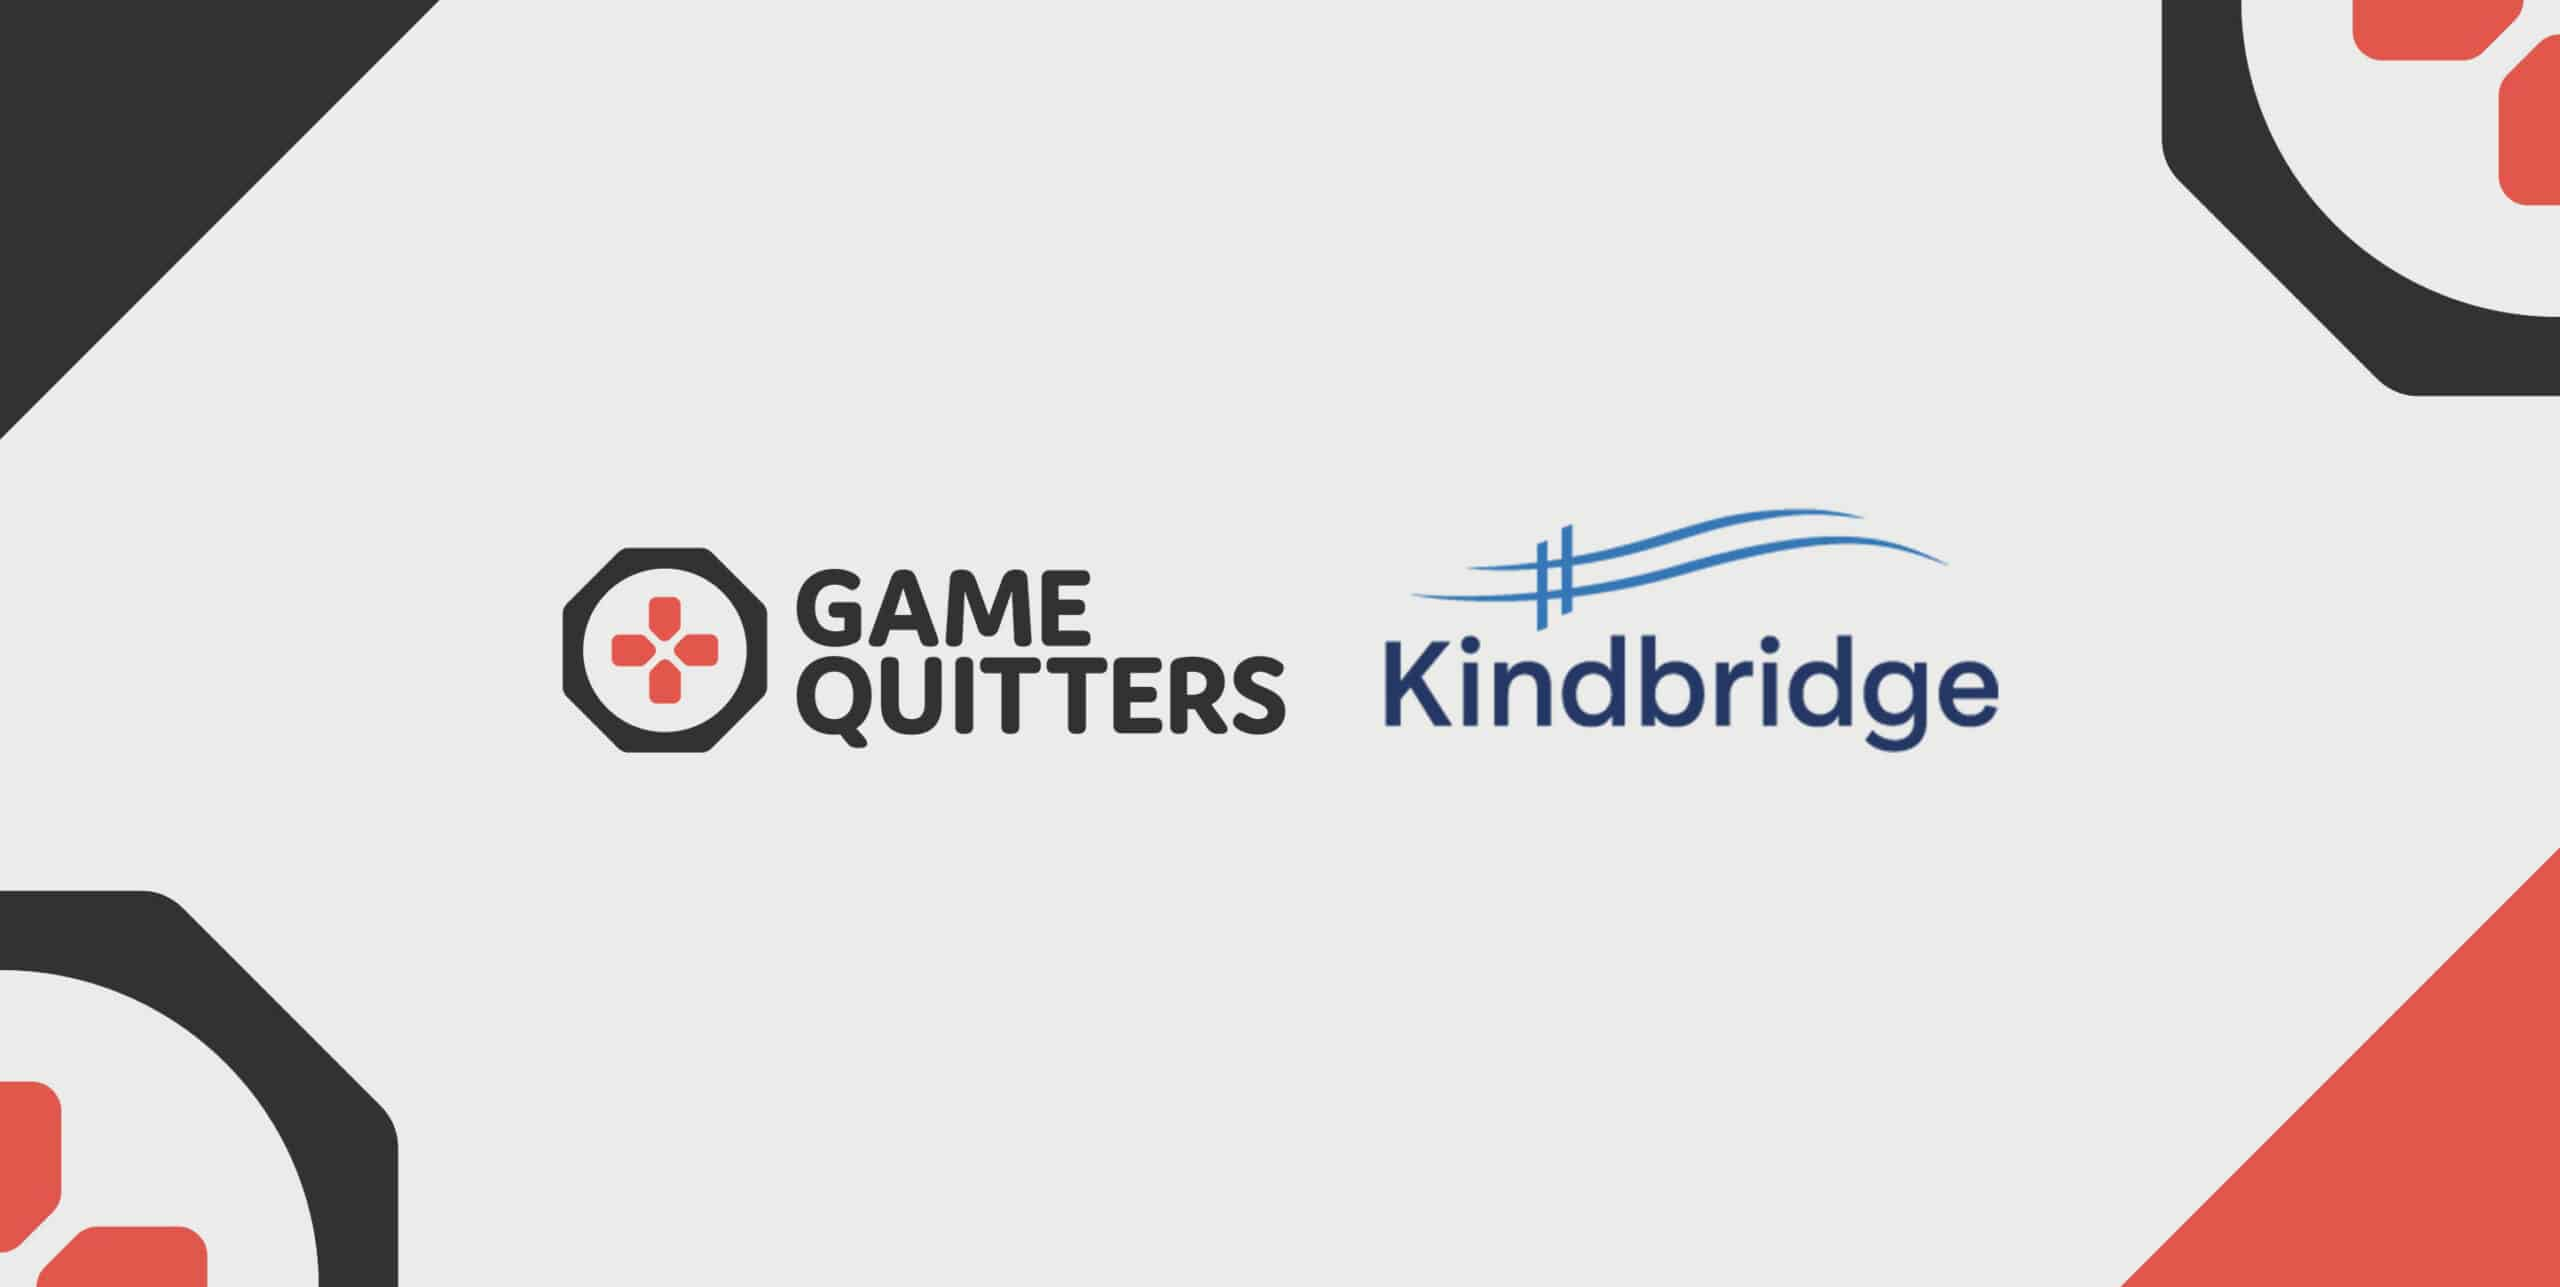 Game Quitters Kindbridge